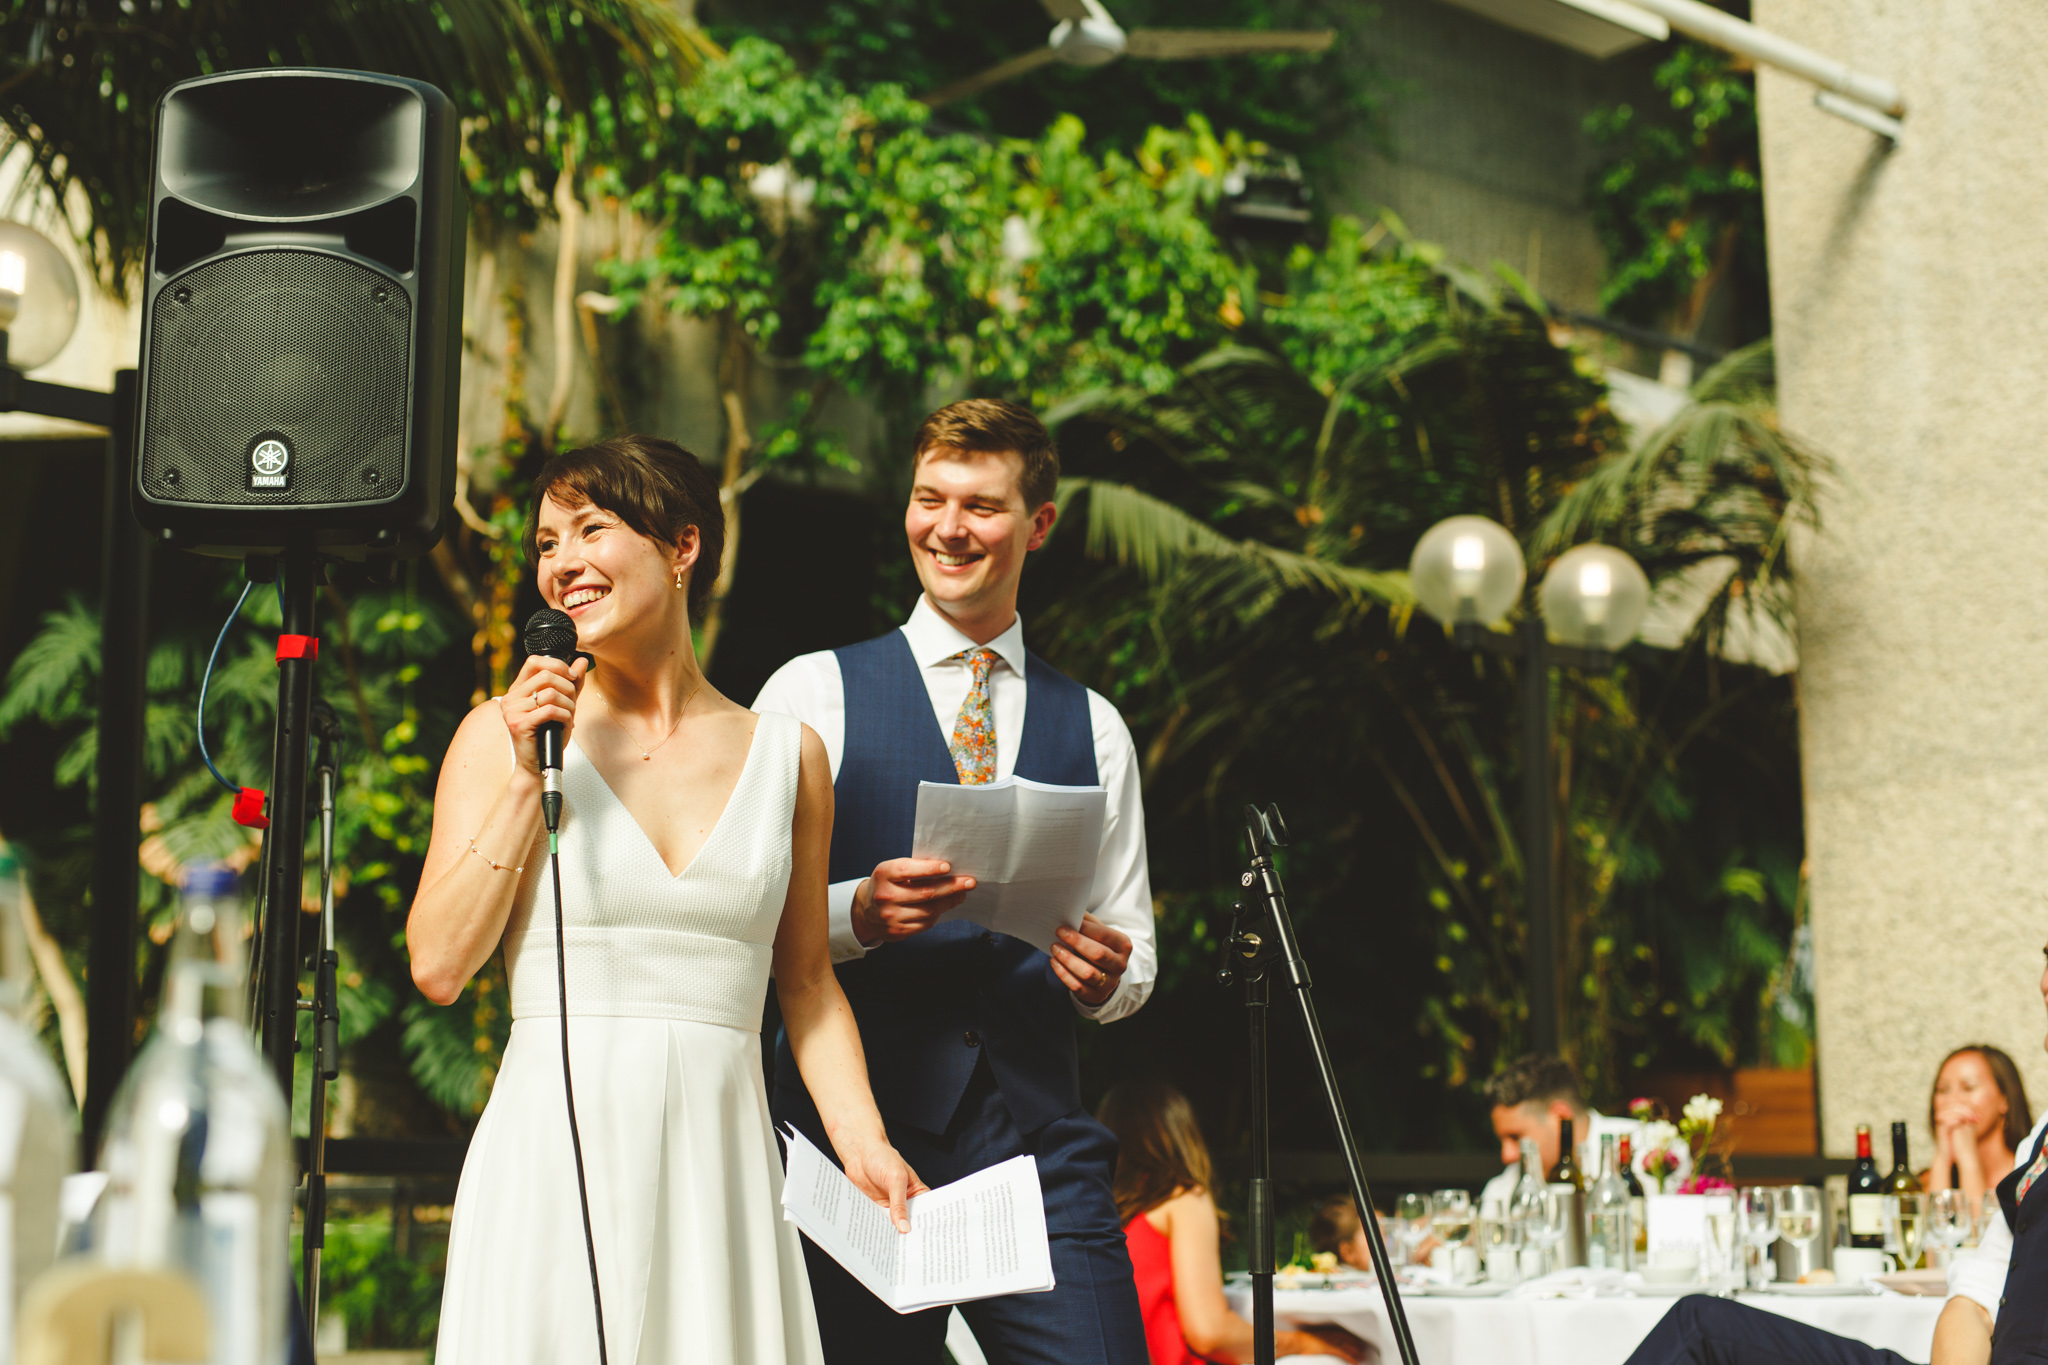 derbyshire-wedding-photographer-videographer-camera-hannah-73.jpg